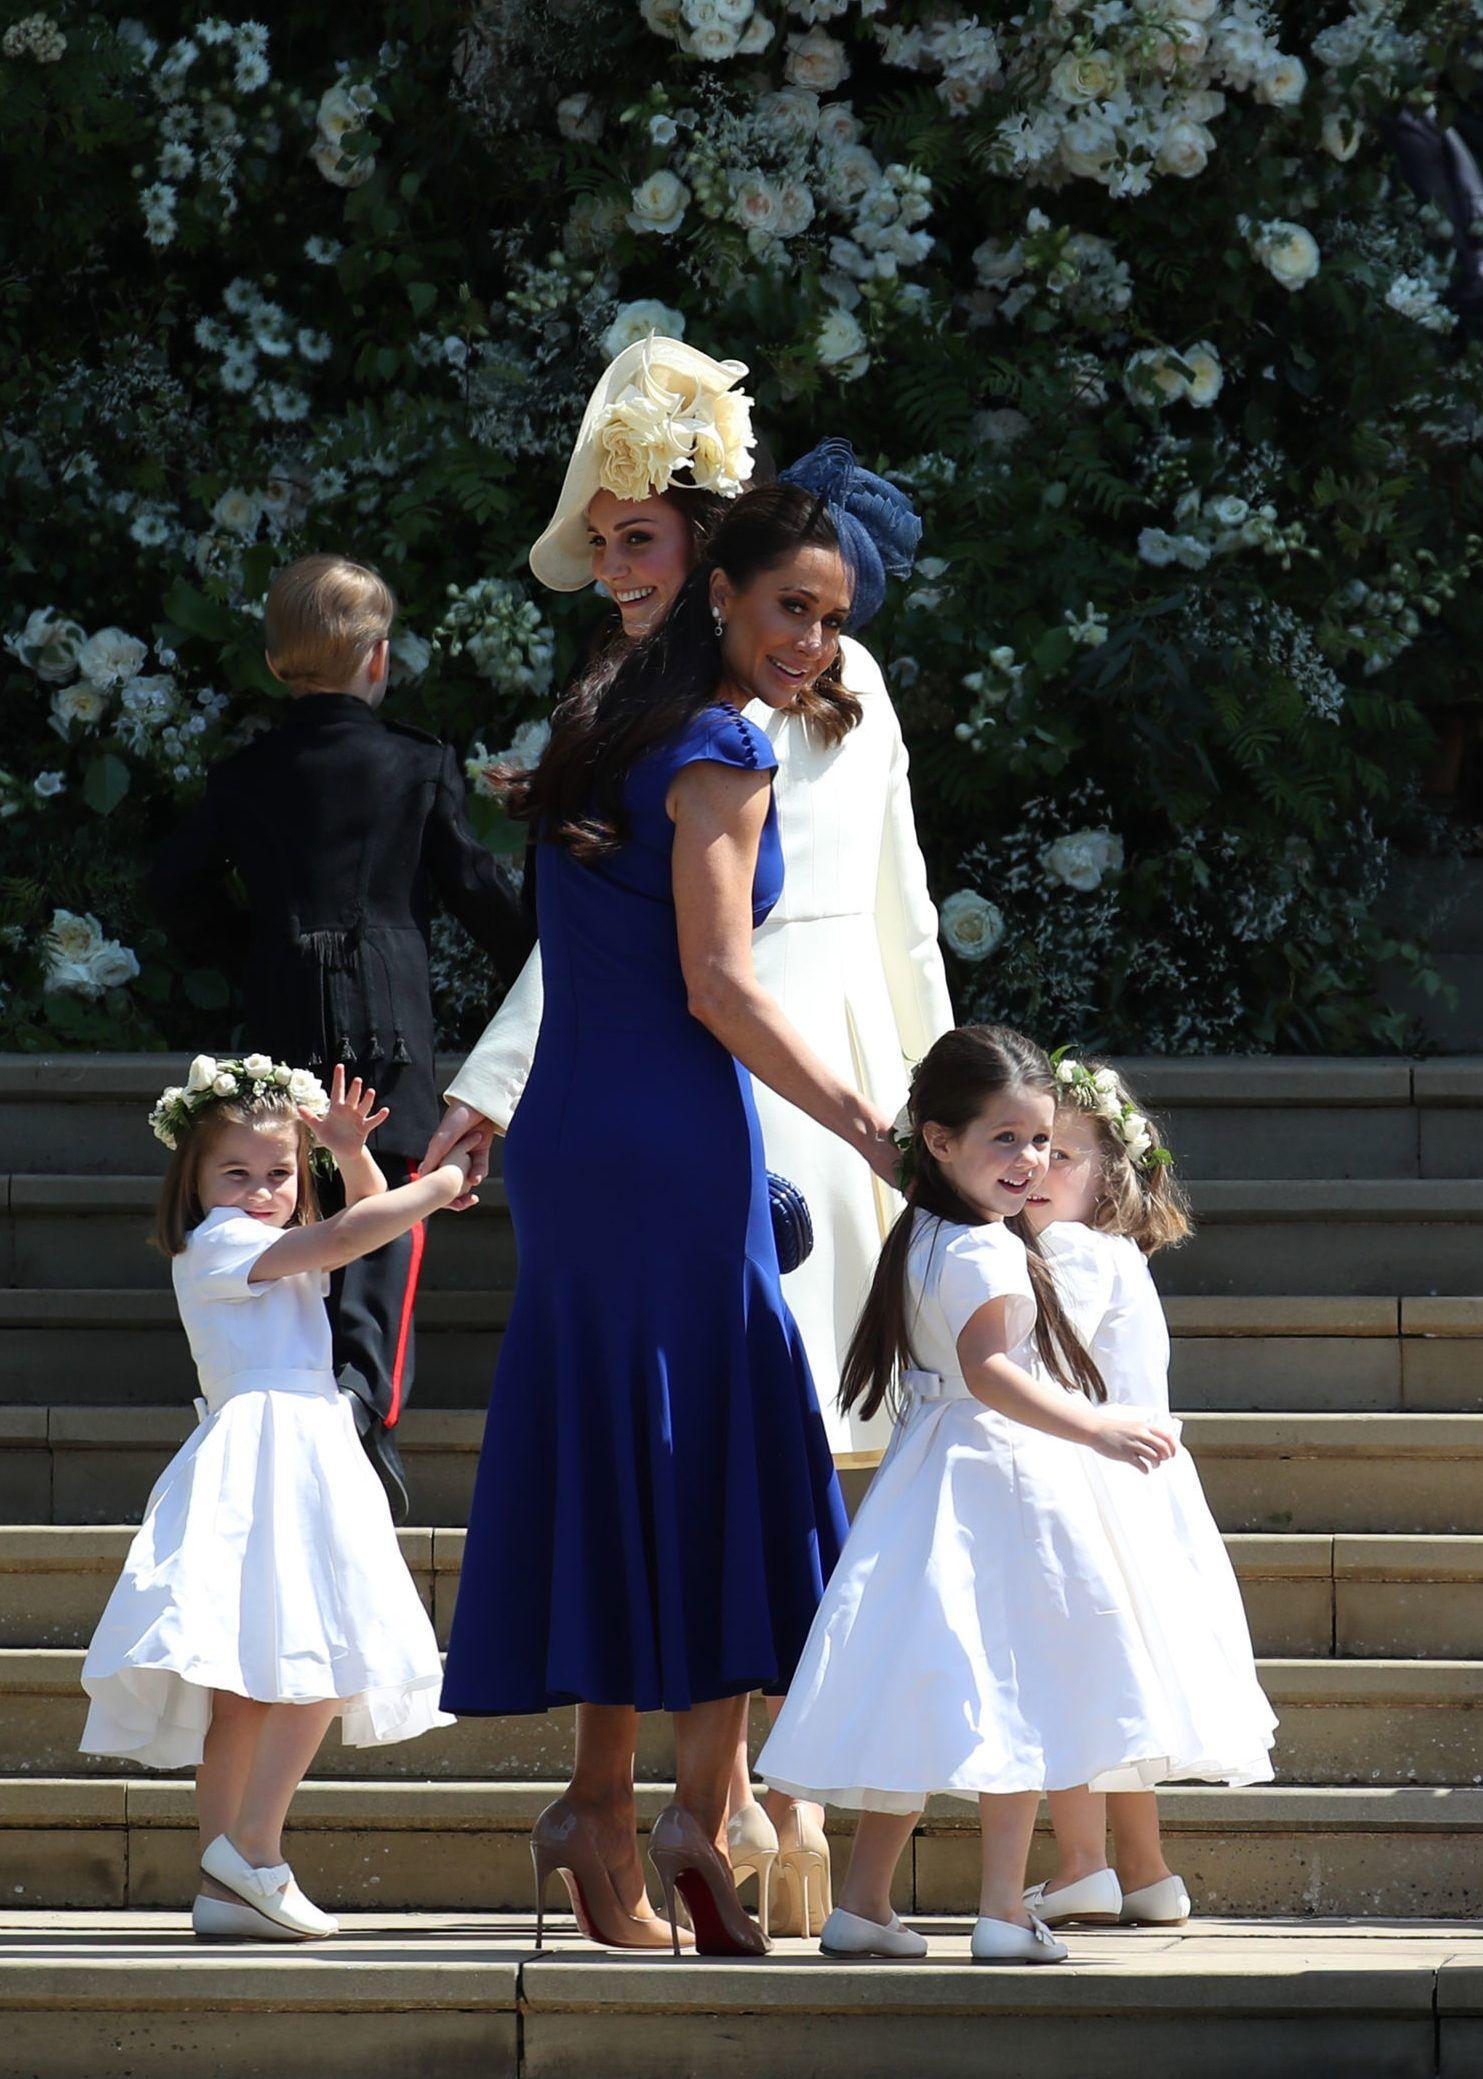 Matrimonio Meghan E Harry : Le foto del royal wedding il matrimonio tra harry e meghan markle